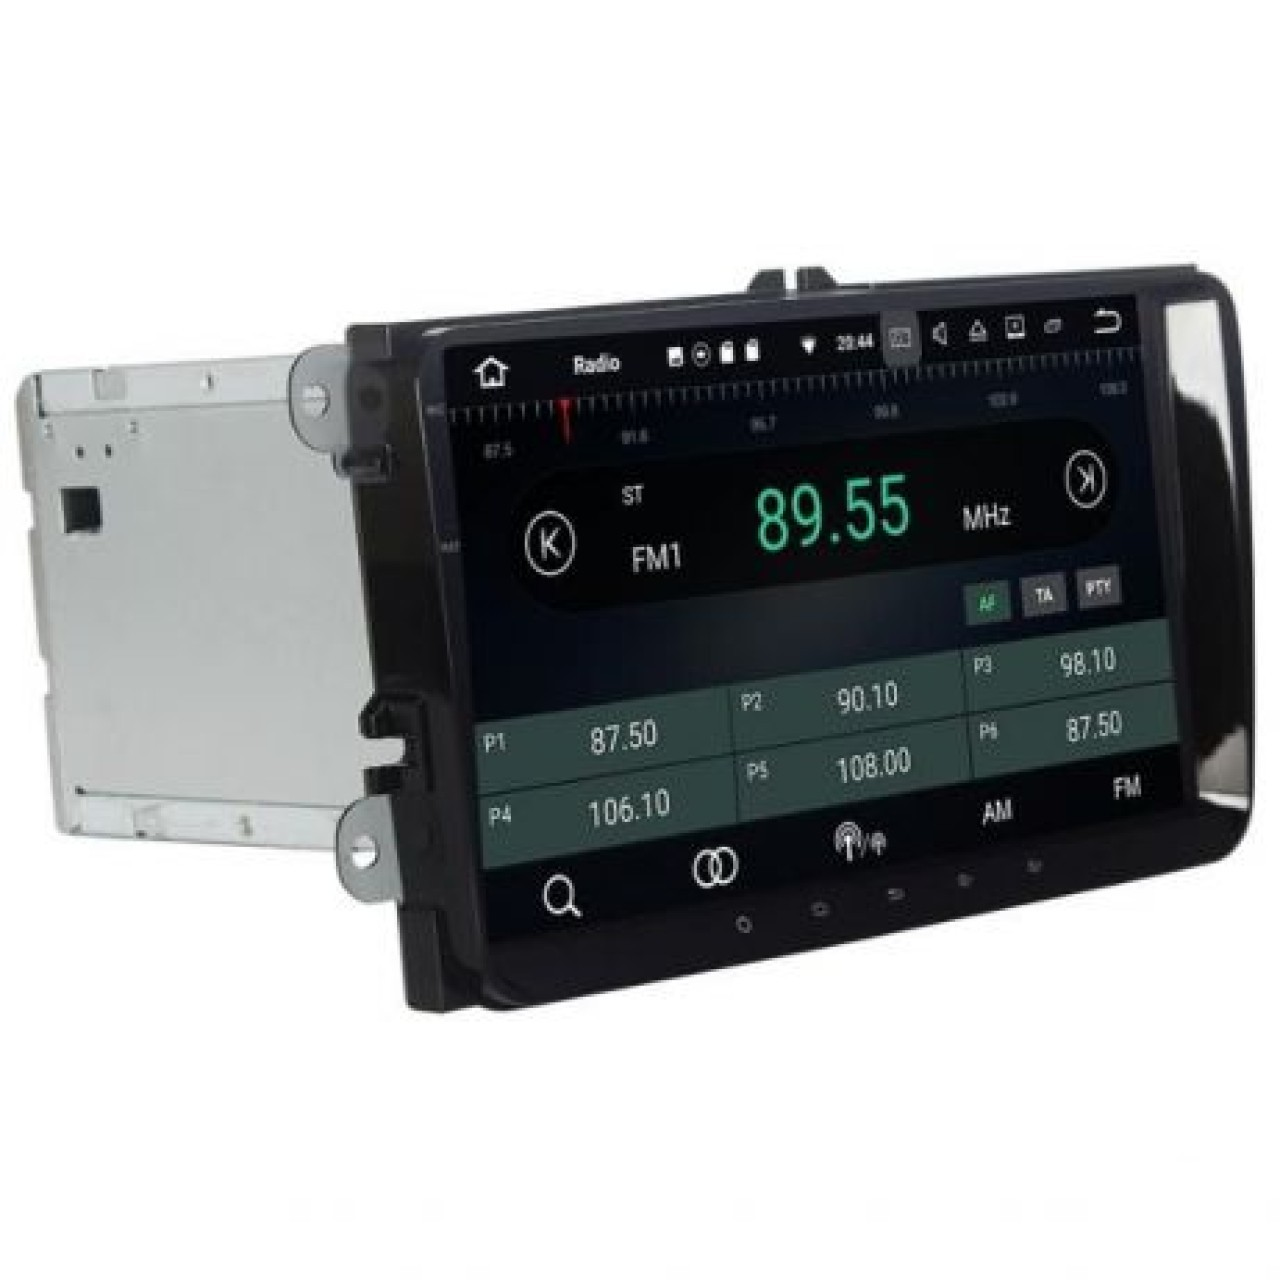 NAVIGATIE CARPAD ANDROID DEDICATA Skoda Roomster NAVD-MT9800 9'' 16GB 2GB RAM GPS WAZE CAMERA BONUS!